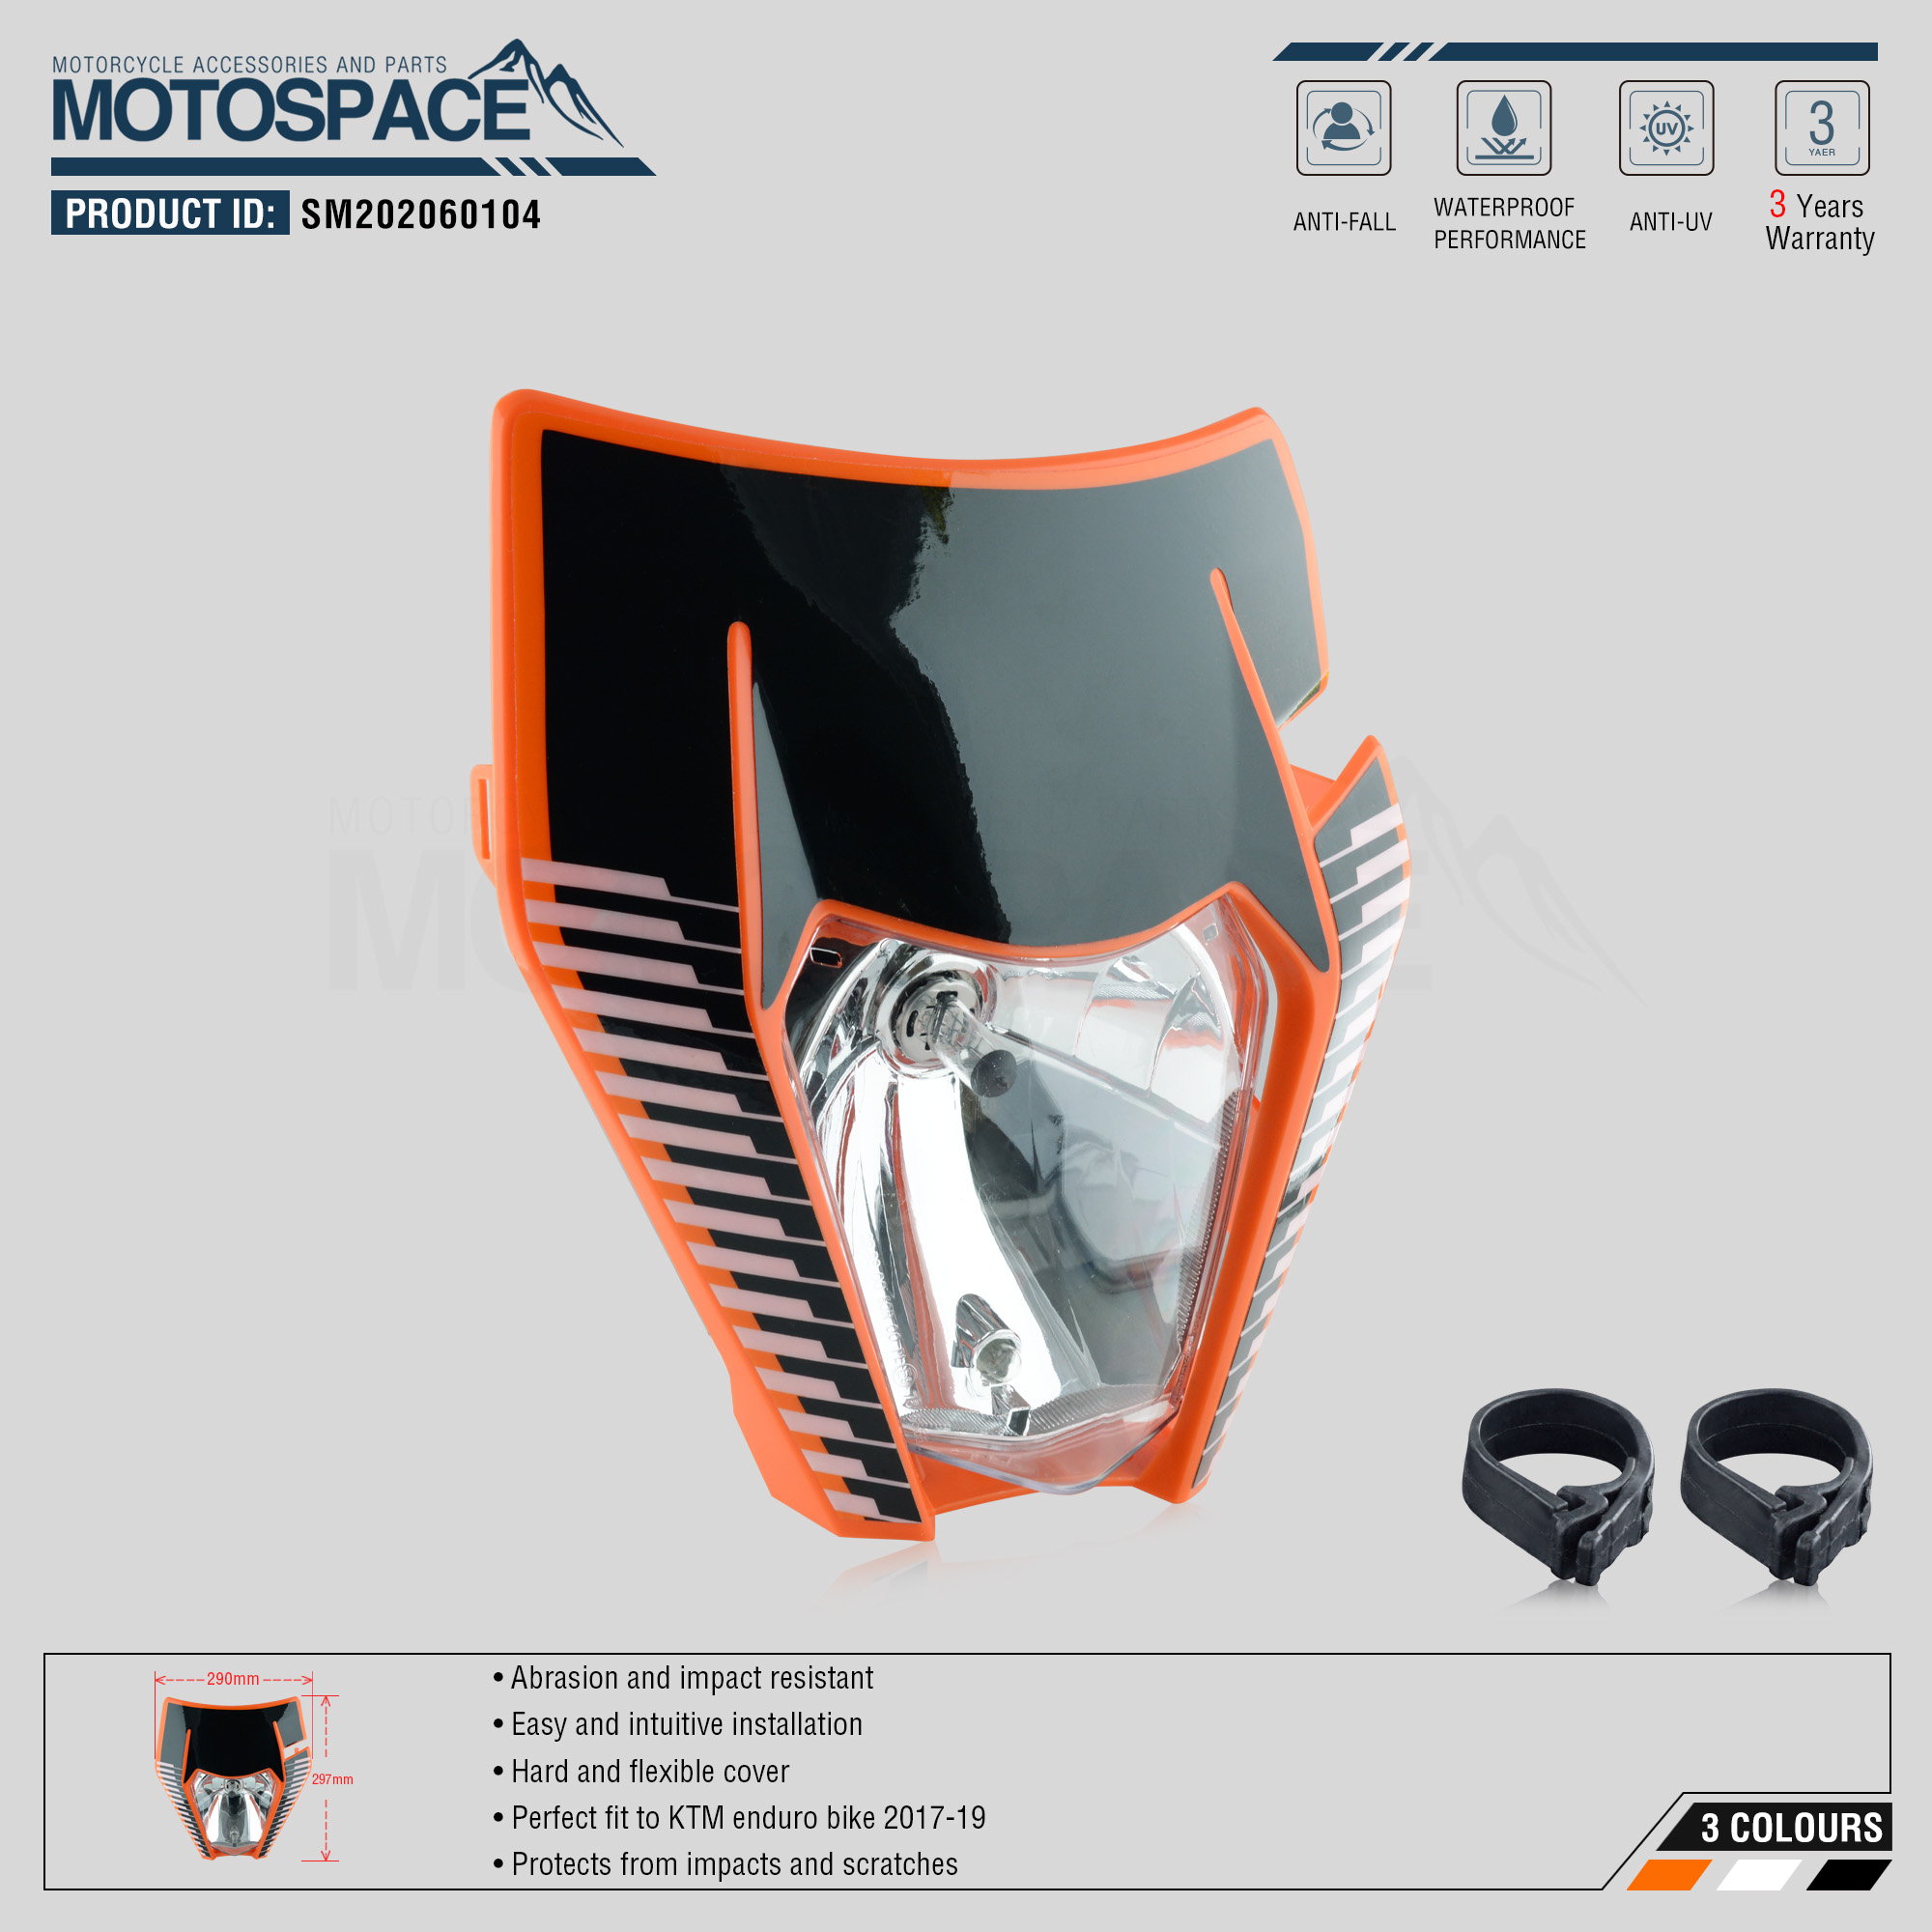 Spacemotors Headlight Headlamp With Sticker For KTM SX F EXC XCF SMR 2017 2018 2019 Motorcycle Dirt Bike MX Enduro Supermoto